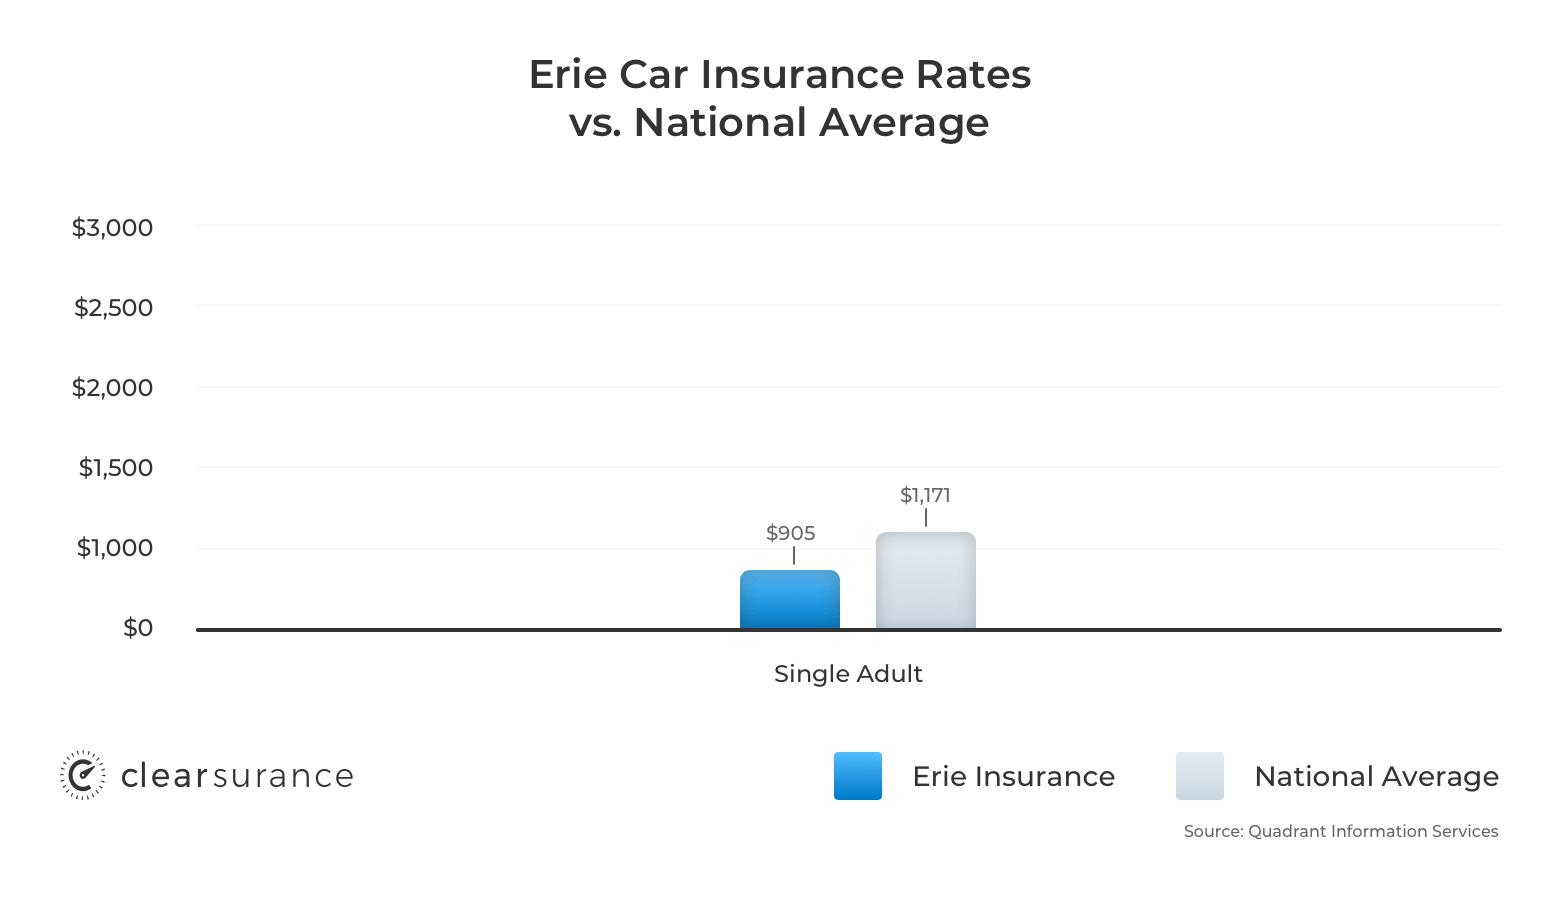 Erie car insurance rates